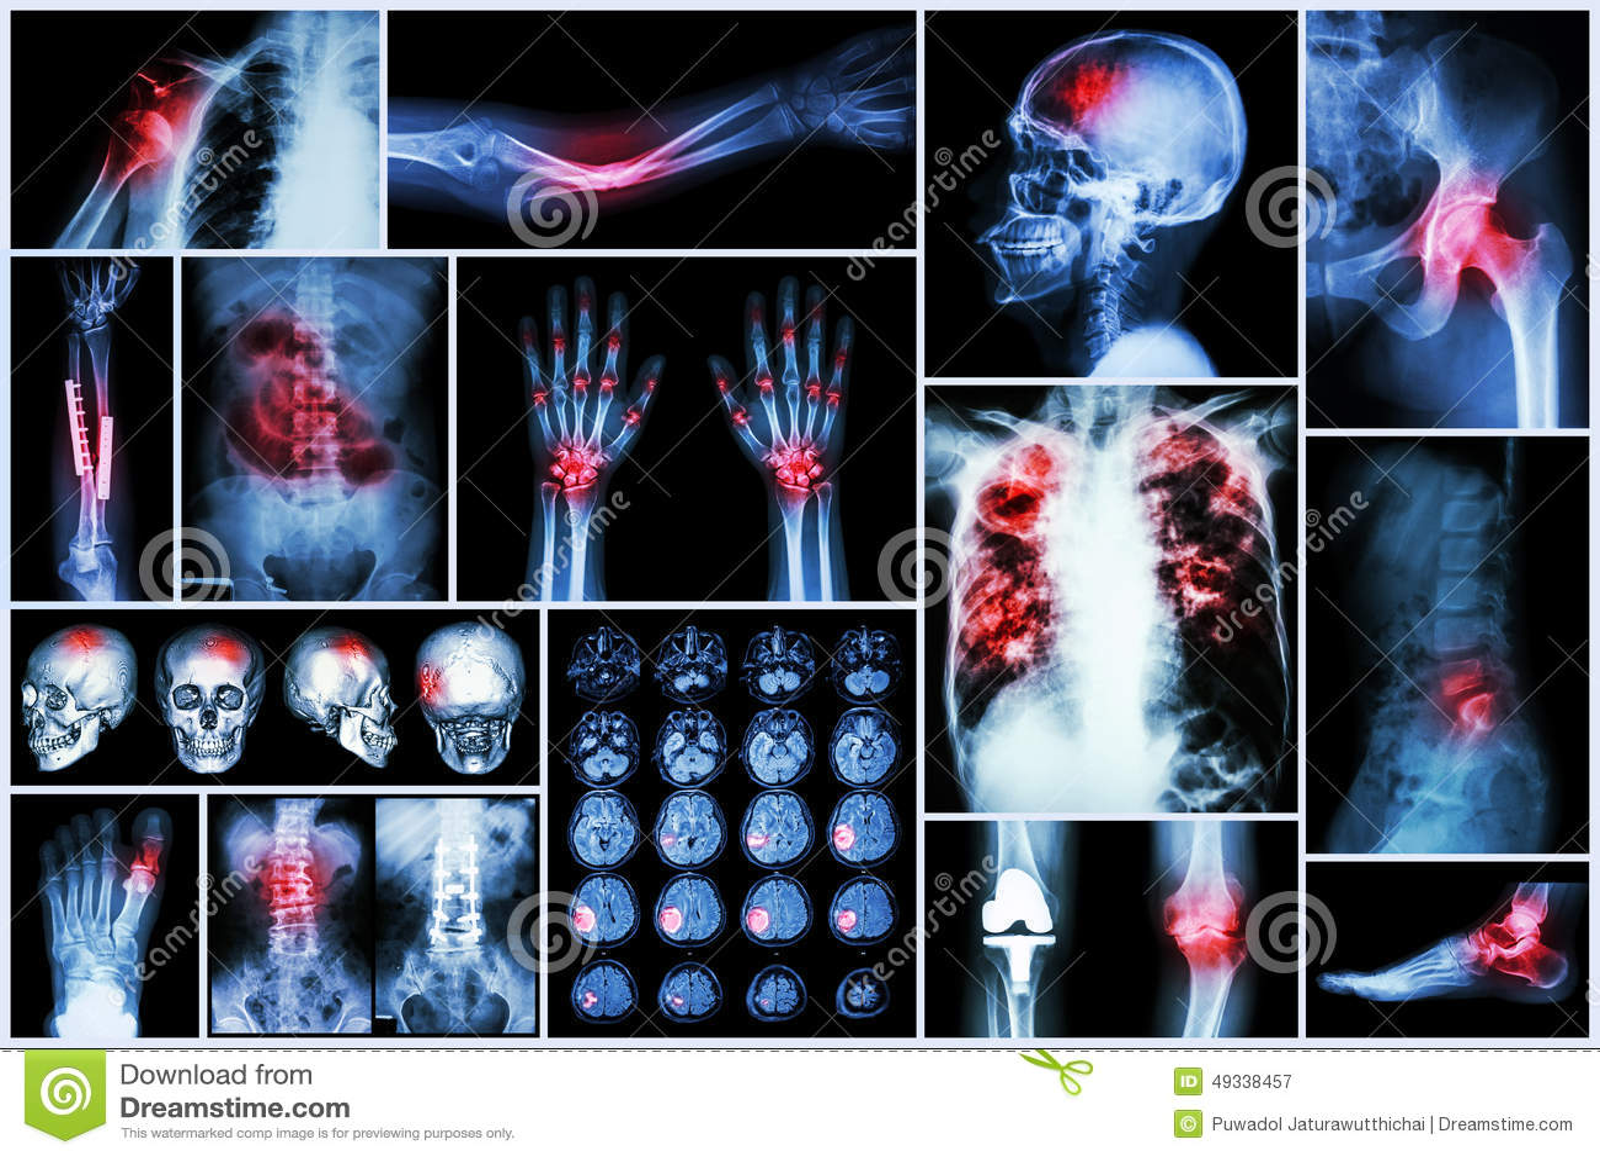 X-ray multiple disease (Stroke (cerebrovascular accident) : cva ,Pulmonary tuberculosis ,Bone fracture ,Shoulder dislocation